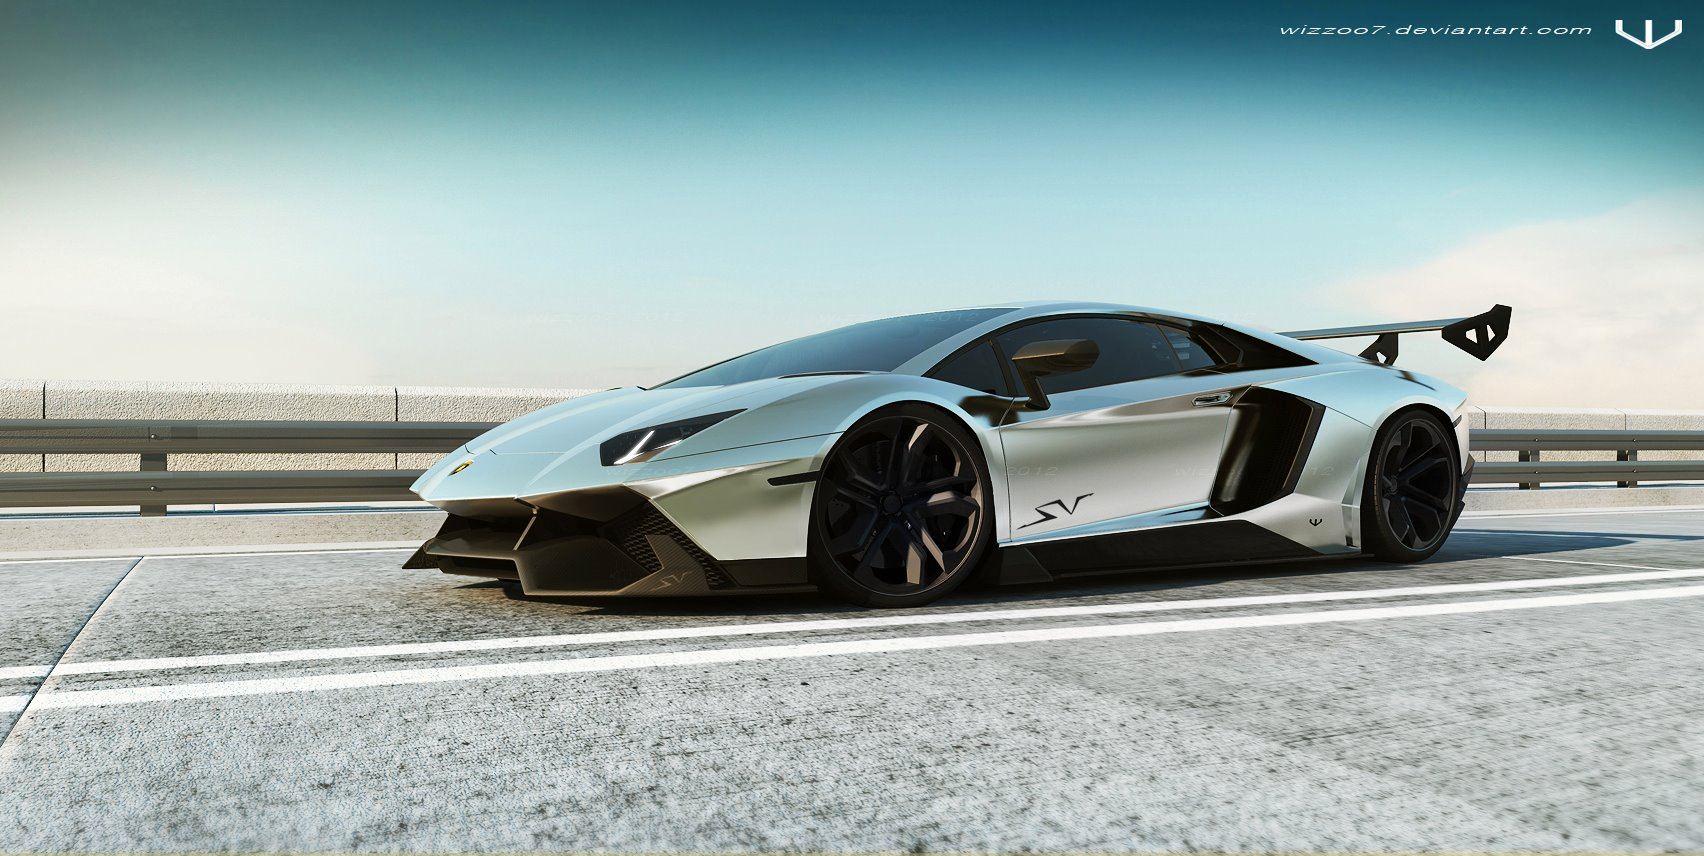 Lamborghini Dealers Taking Waiting List Deposits For